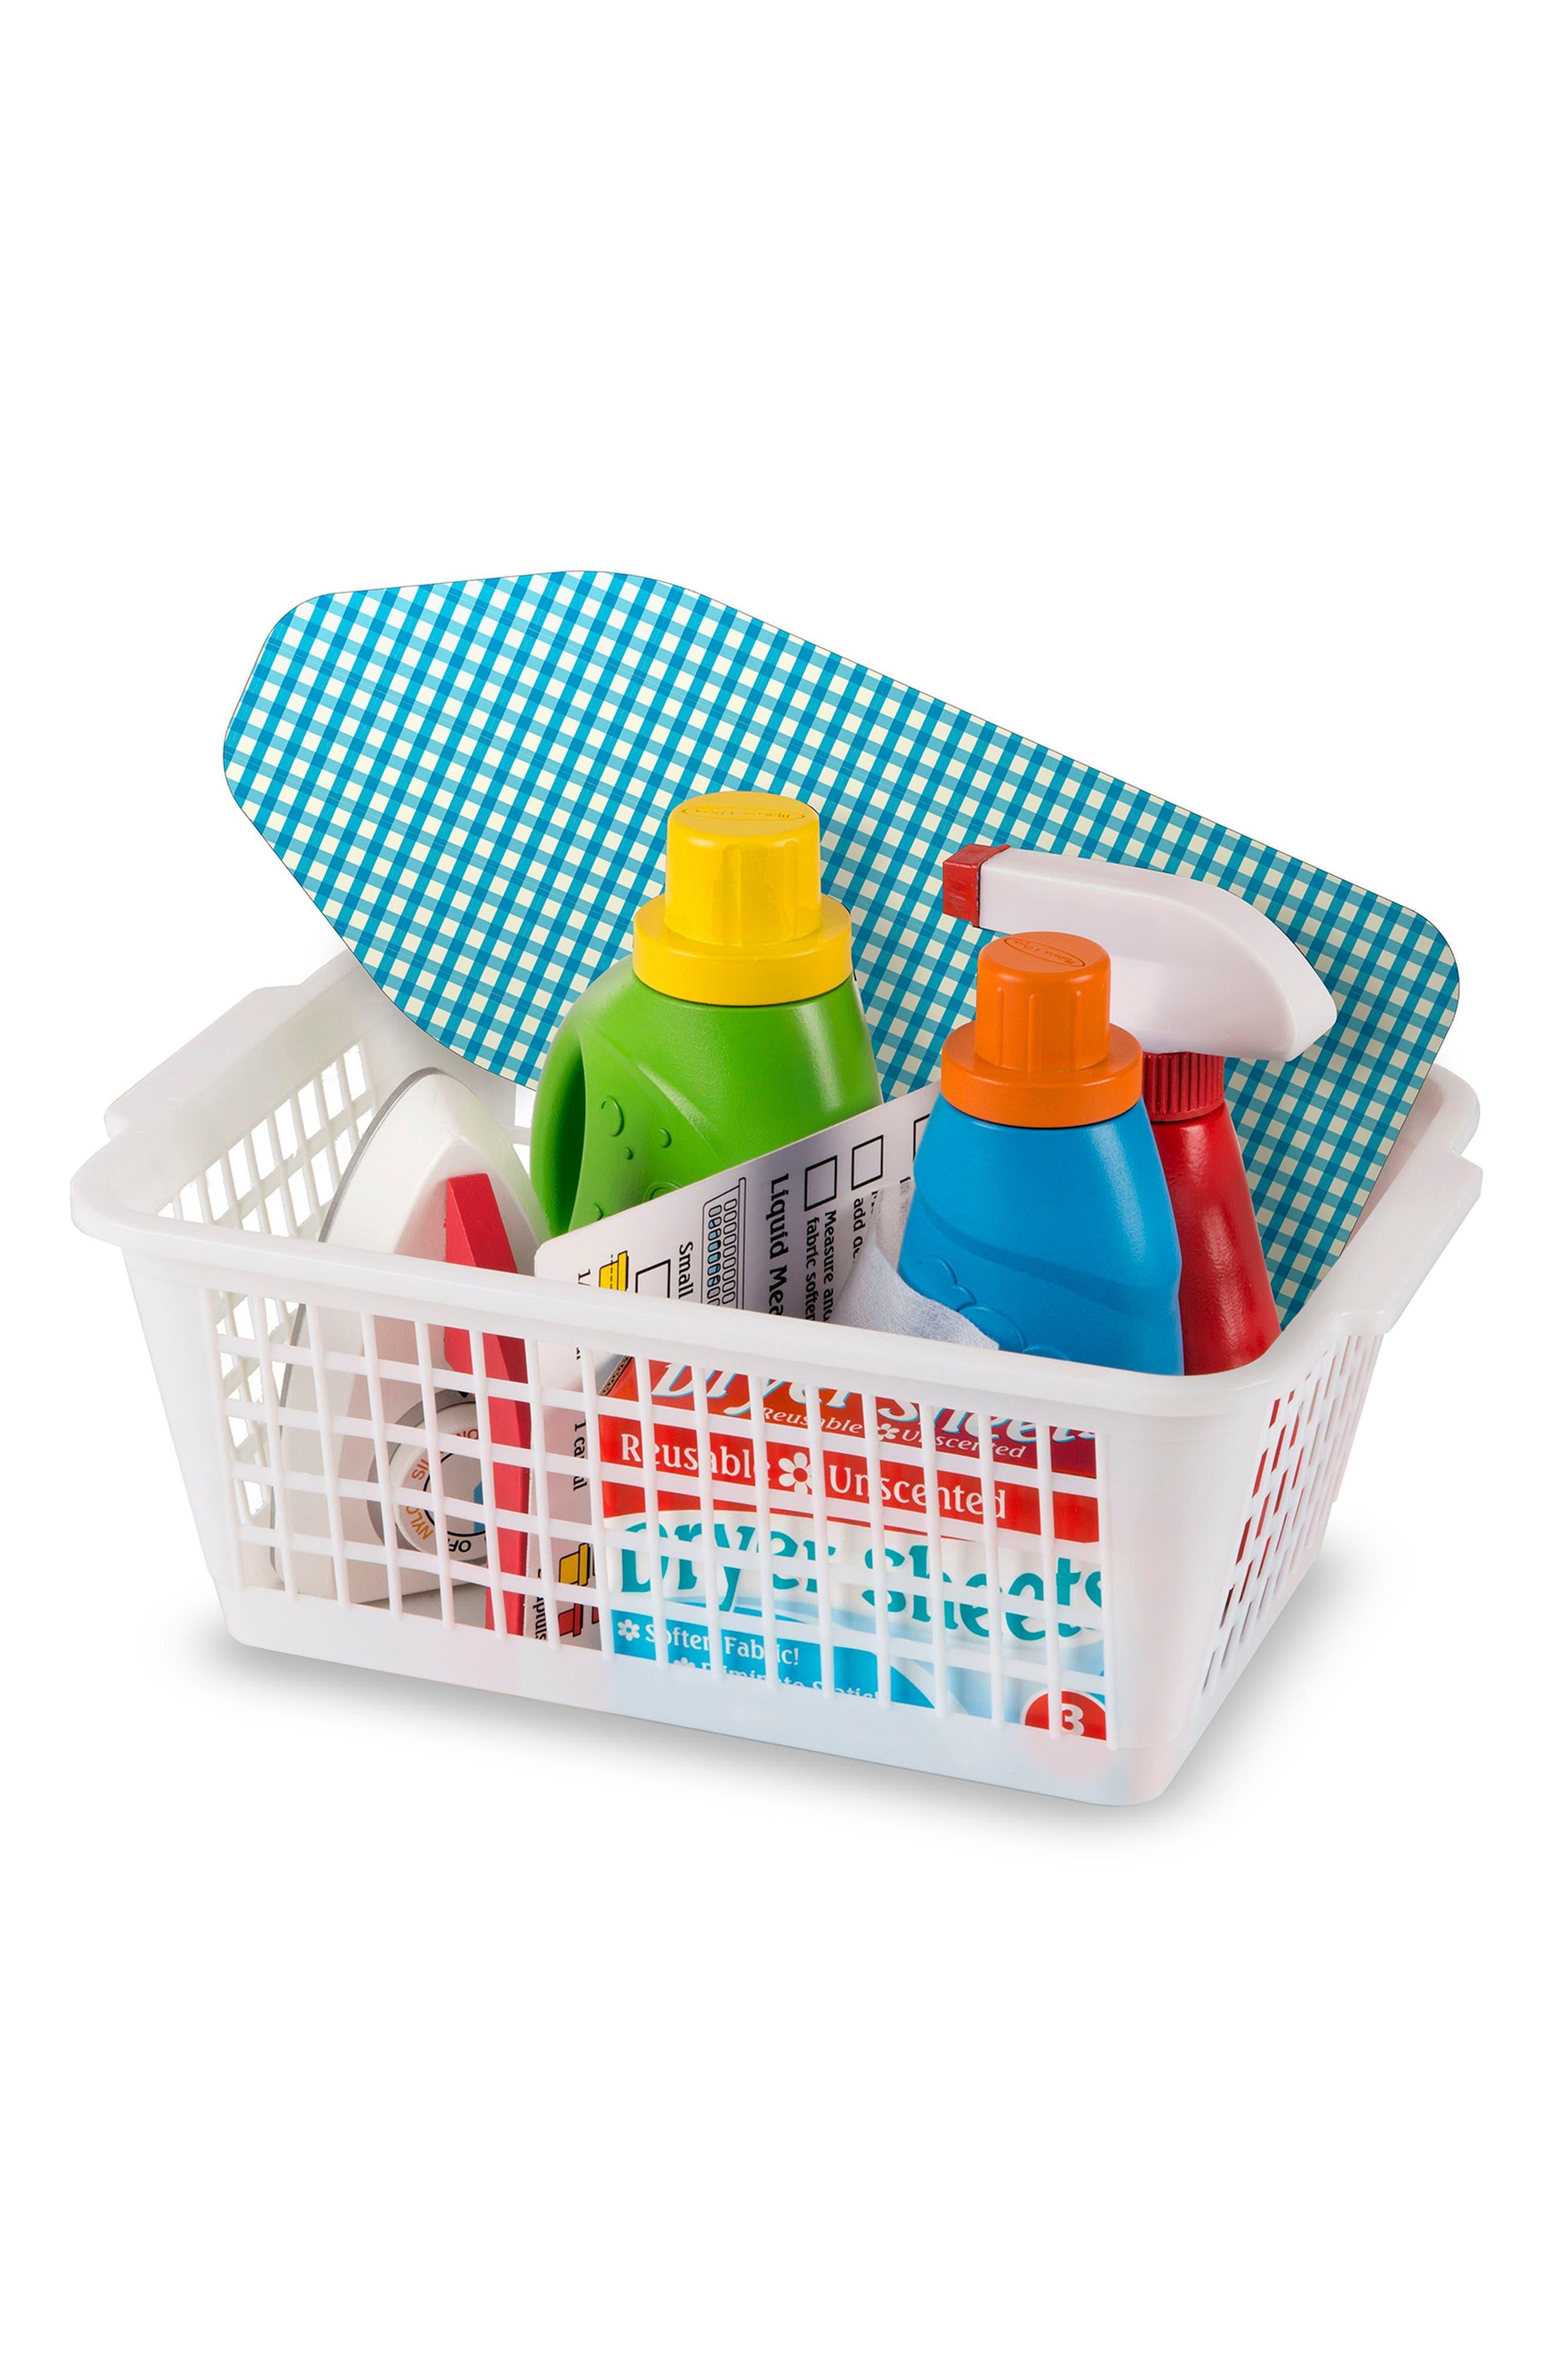 11-Piece Laundry Basket Play Set,                             Alternate thumbnail 2, color,                             Multi